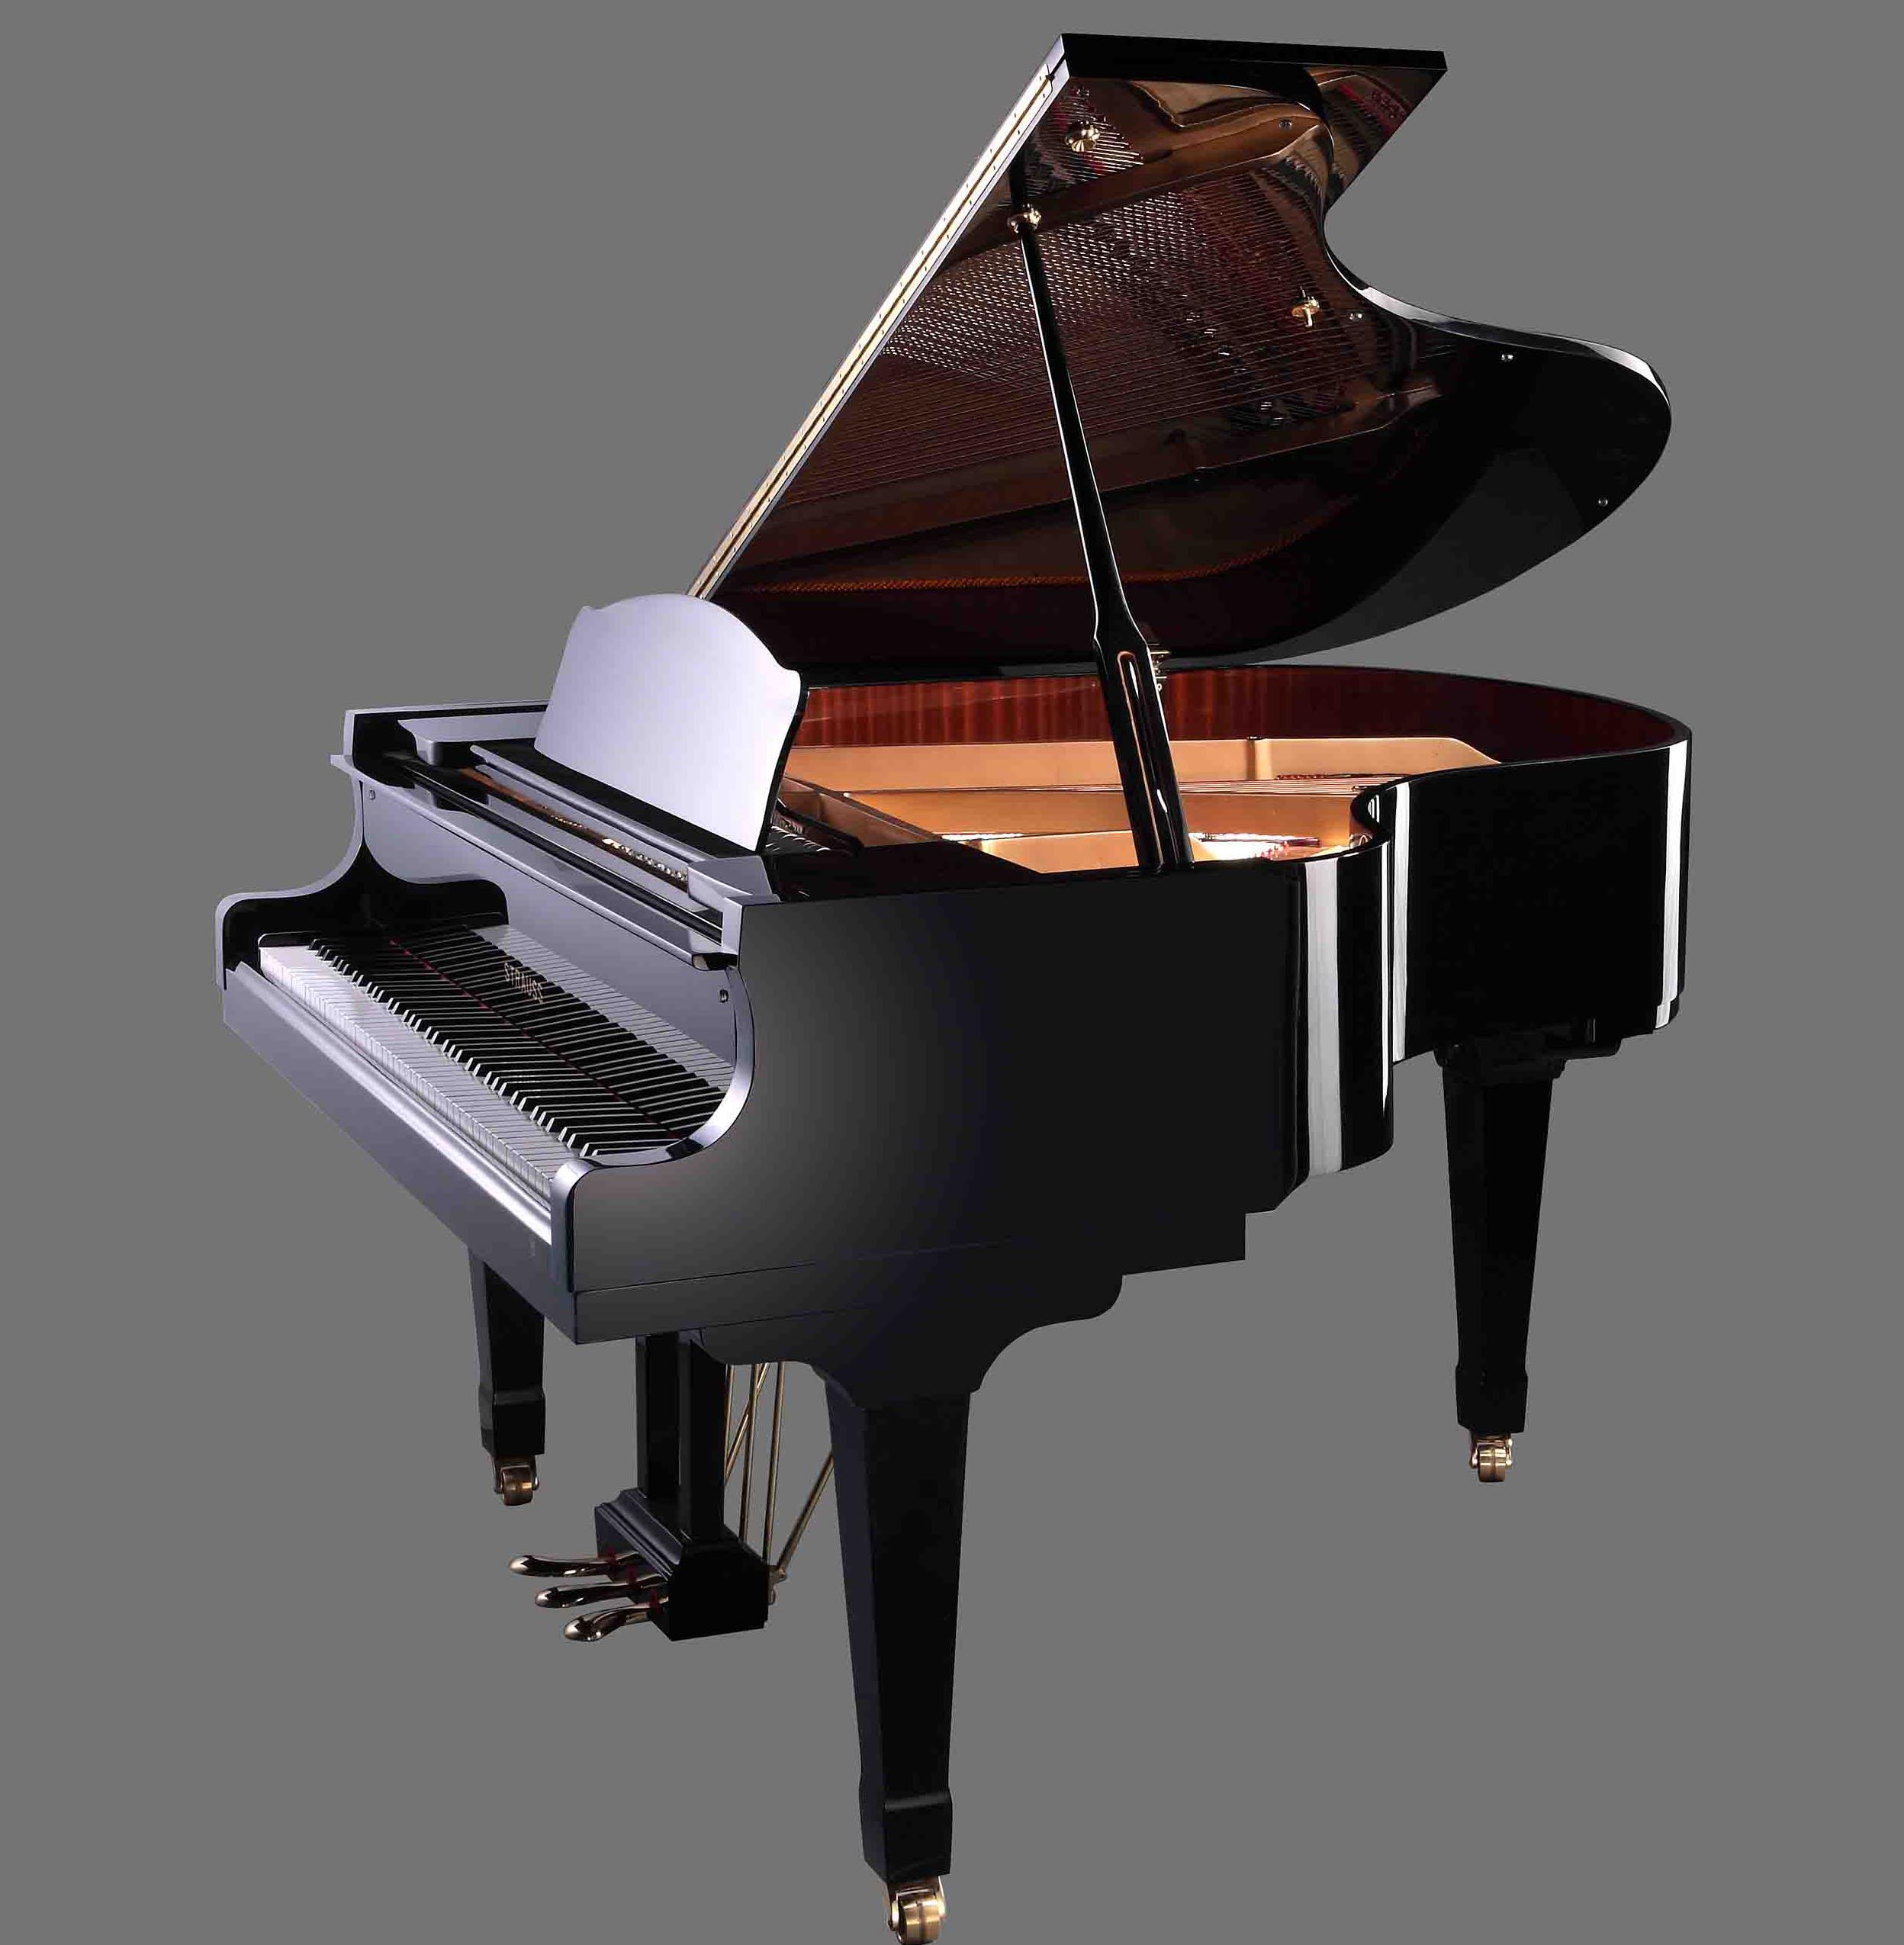 gp-170 三角钢琴